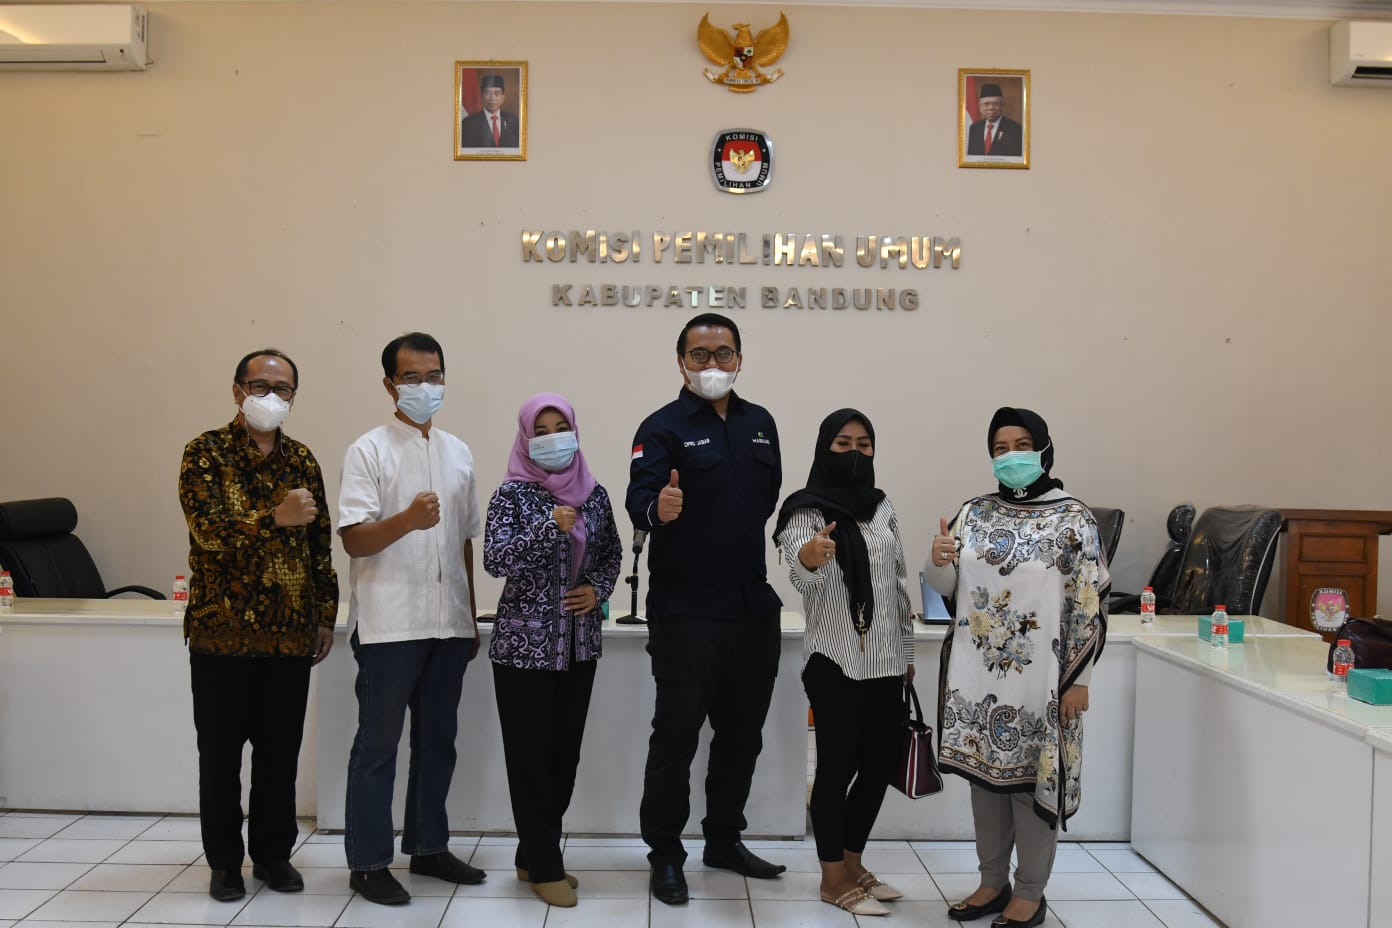 Jajaran Komisi I DPRD Provinsi Jawa Barat ketika mengunjungi KPU untuk menanykan persiapan Pilpres